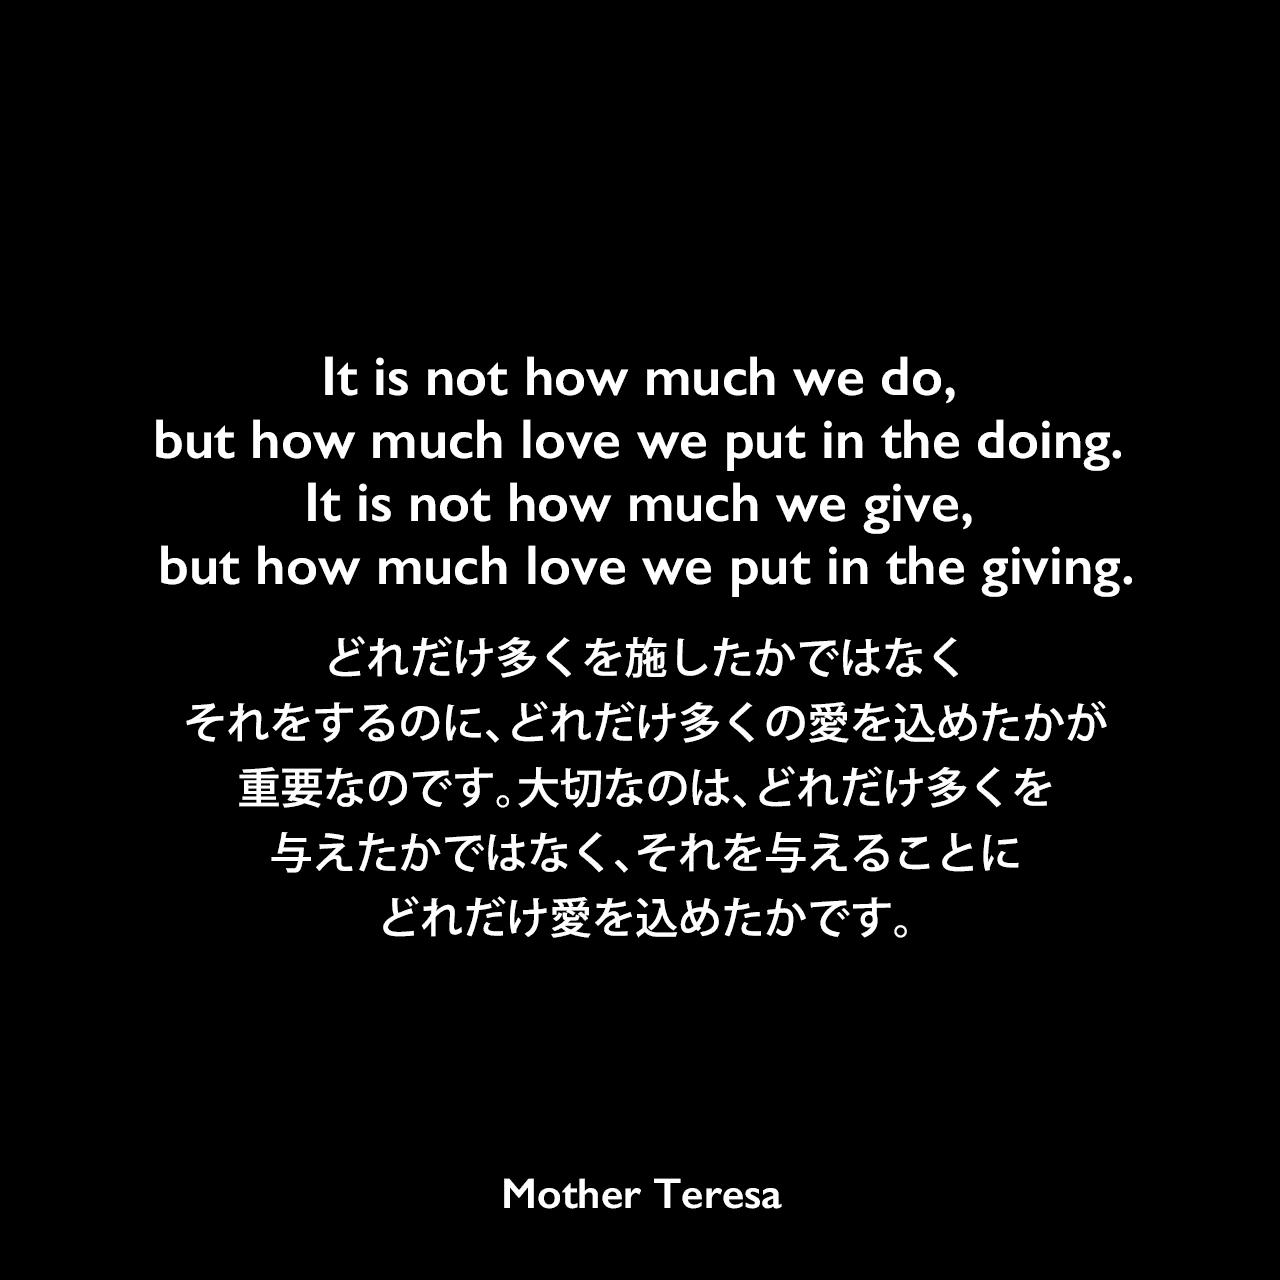 It is not how much we do, but how much love we put in the doing. It is not how much we give, but how much love we put in the giving.どれだけ多くを施したかではなく、それをするのに、どれだけ多くの愛を込めたかが重要なのです。大切なのは、どれだけ多くを与えたかではなく、それを与えることに、どれだけ愛を込めたかです。Mother Teresa